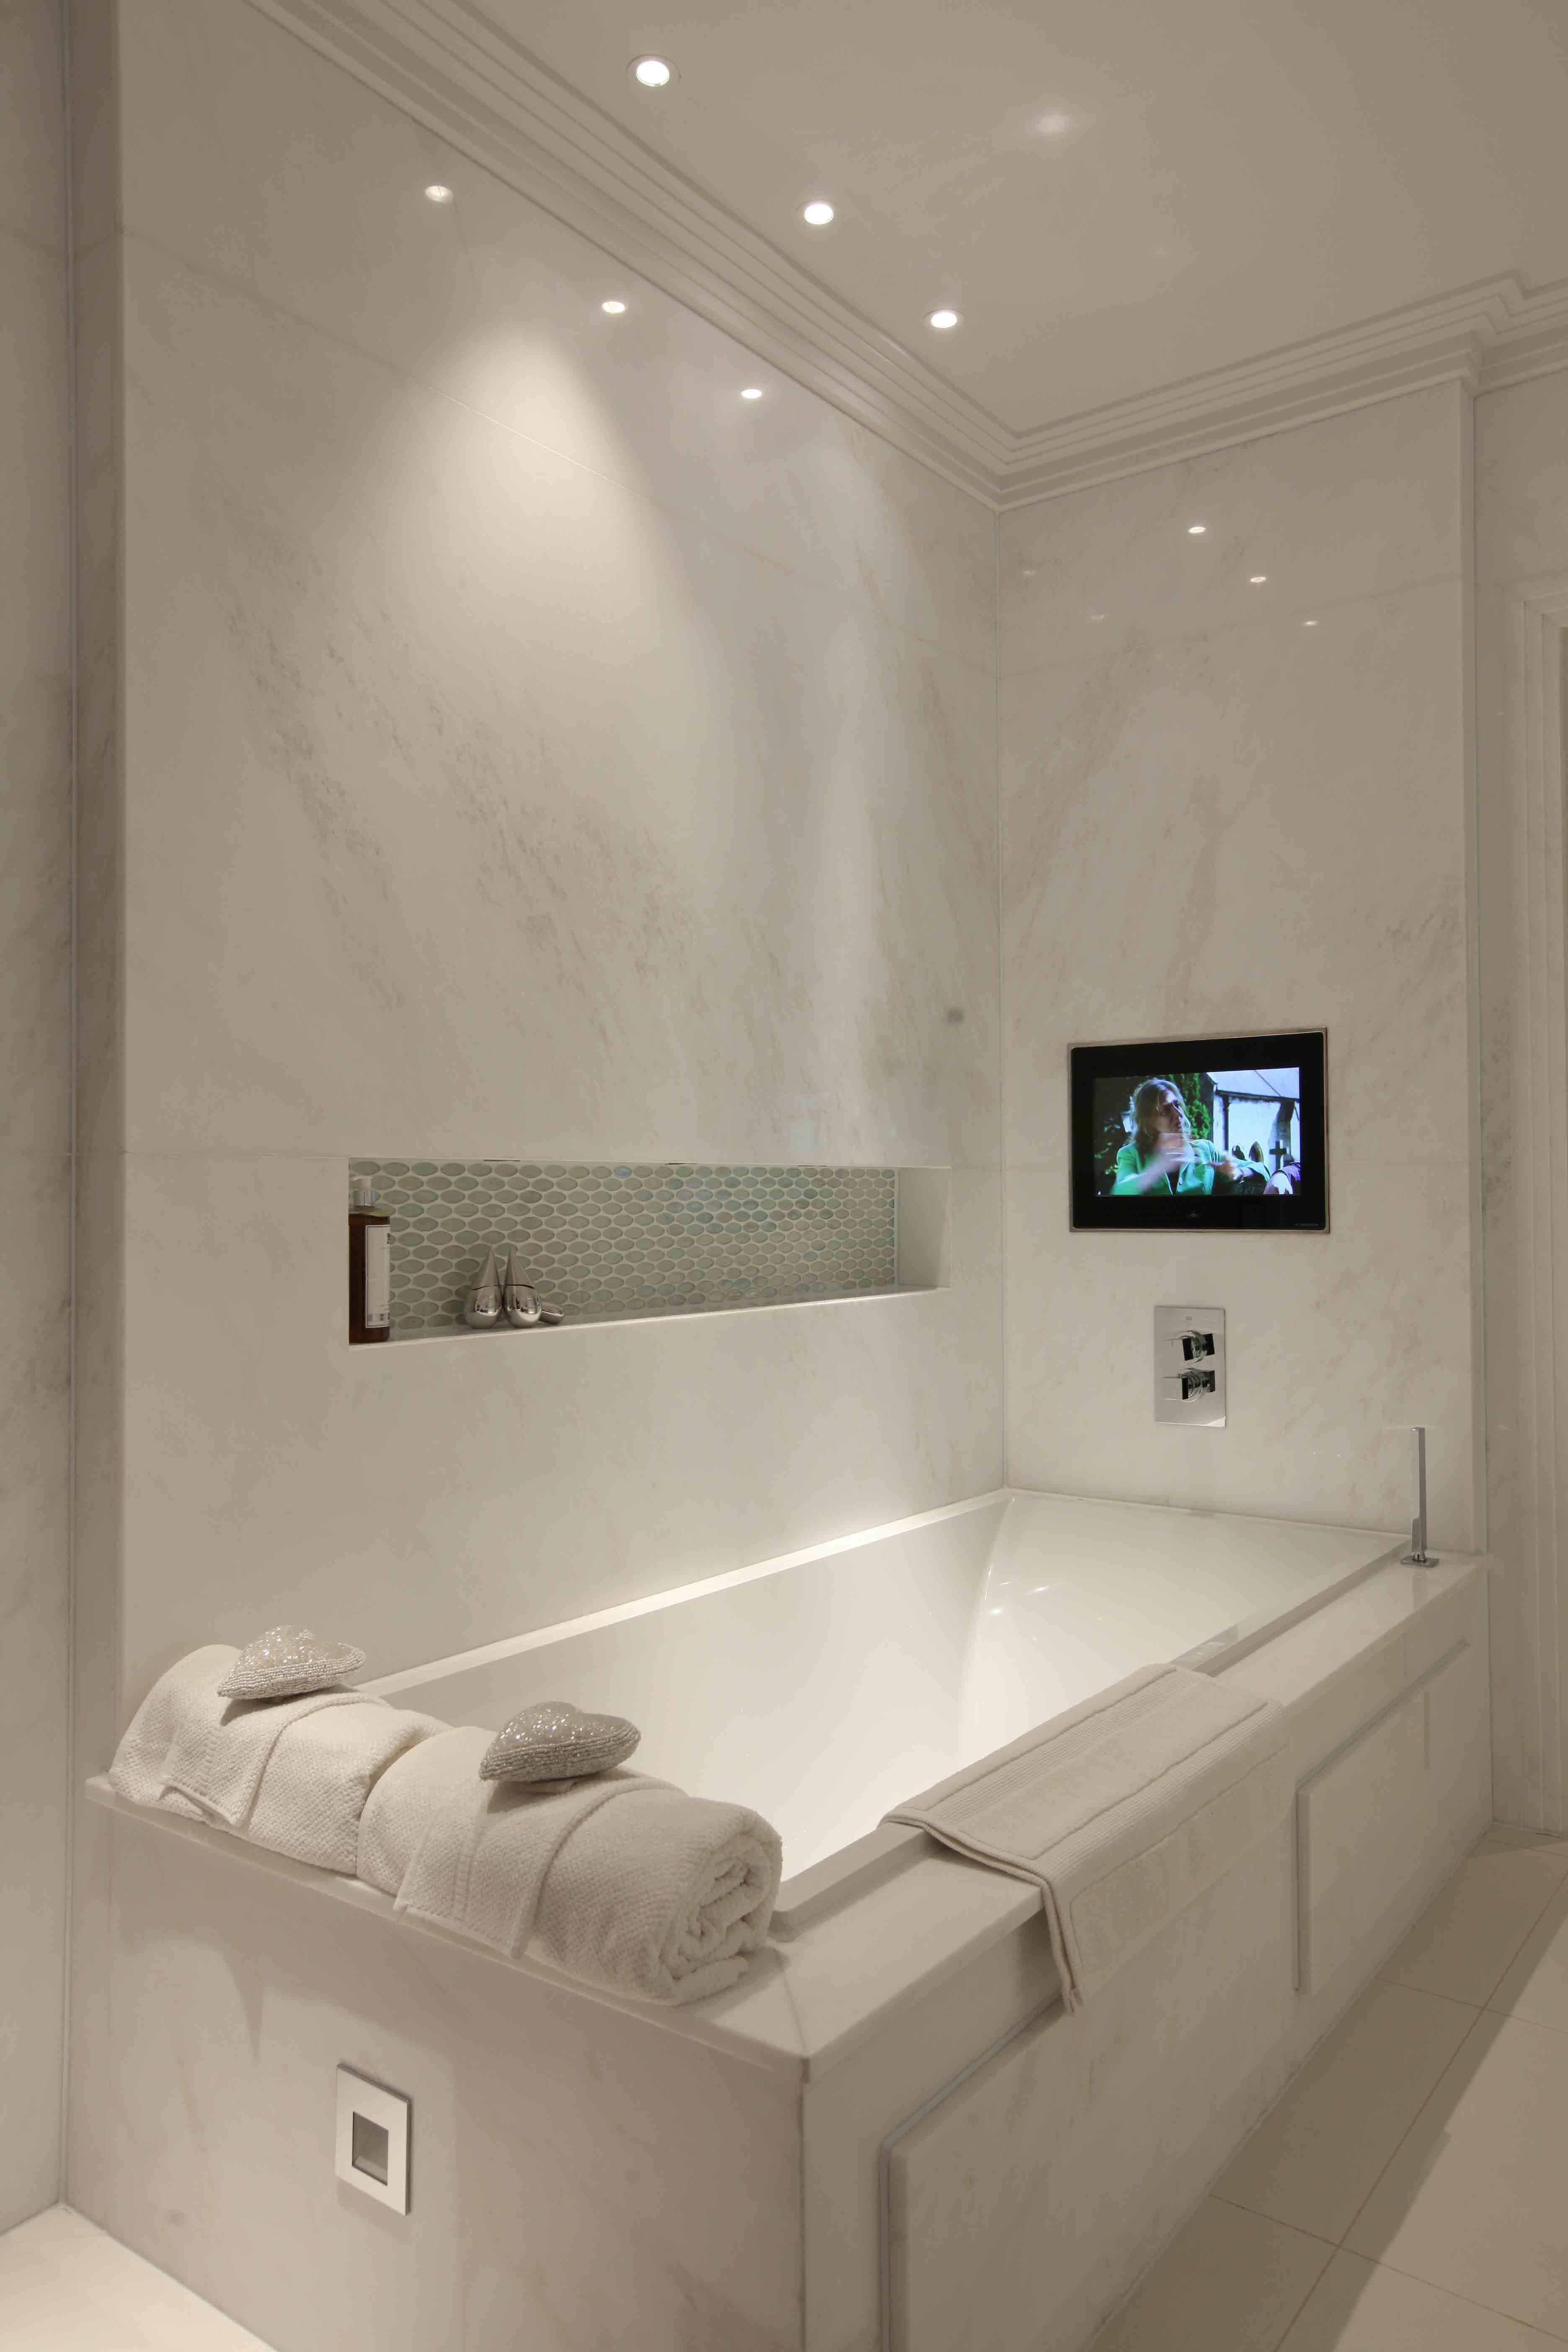 Bathroom Lighting Design By John Cullen Lighting Bathroom Lighting Design Luxury Bathroom Bathroom Design